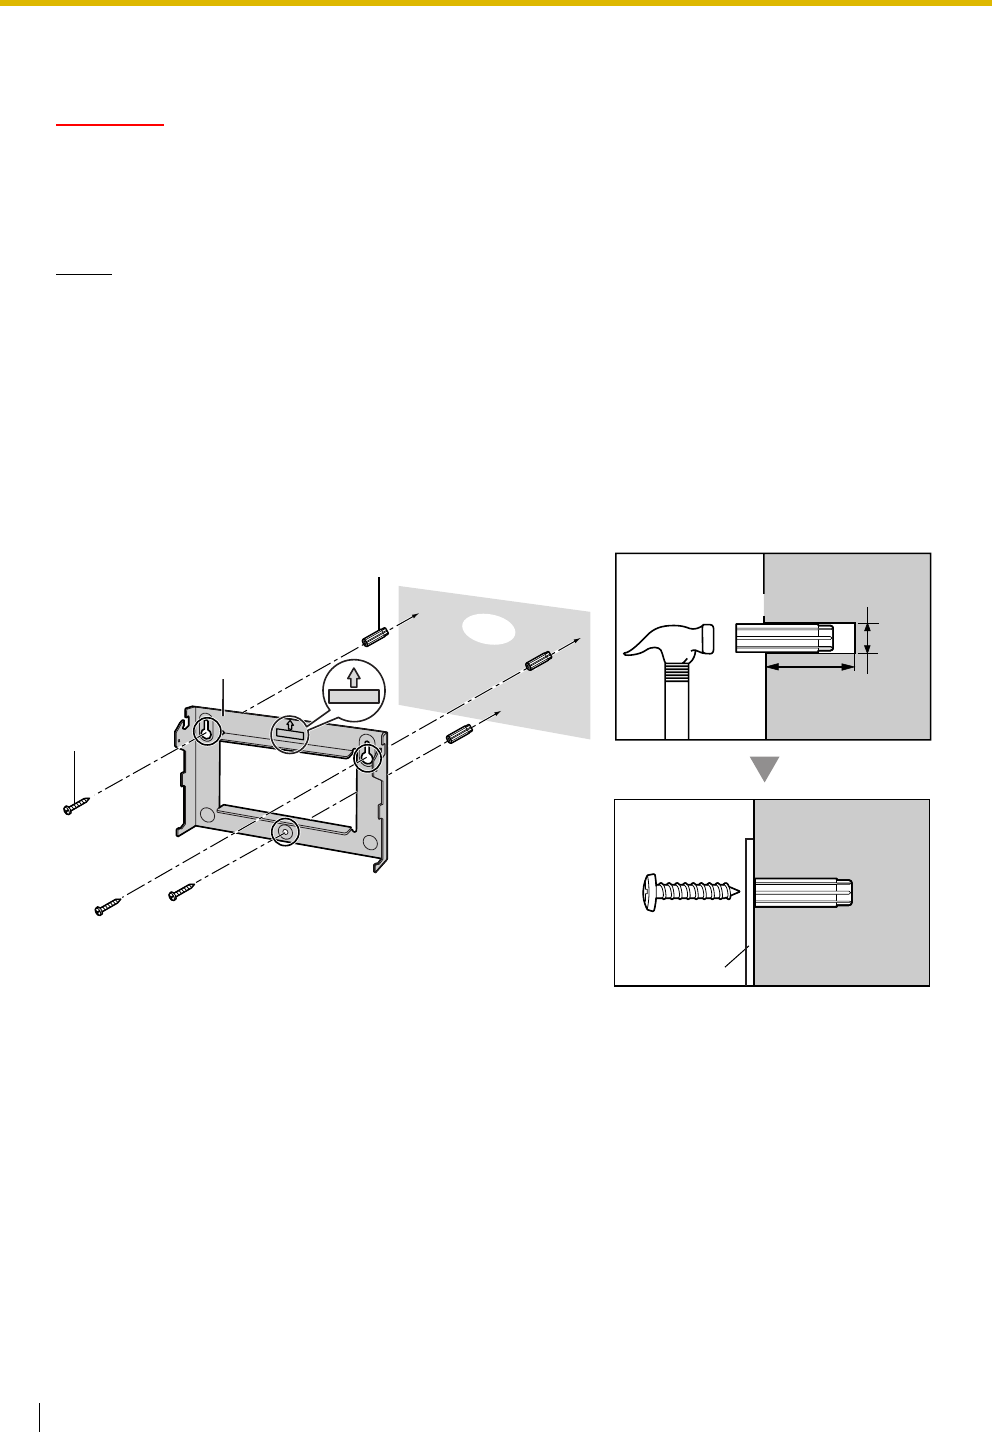 Panasonic Kx Tda100 Installation Manual User To The E8a4aadb 3 Slot Payphone Wiring Diagram 22 Of Hybrid Ip Pbx 64